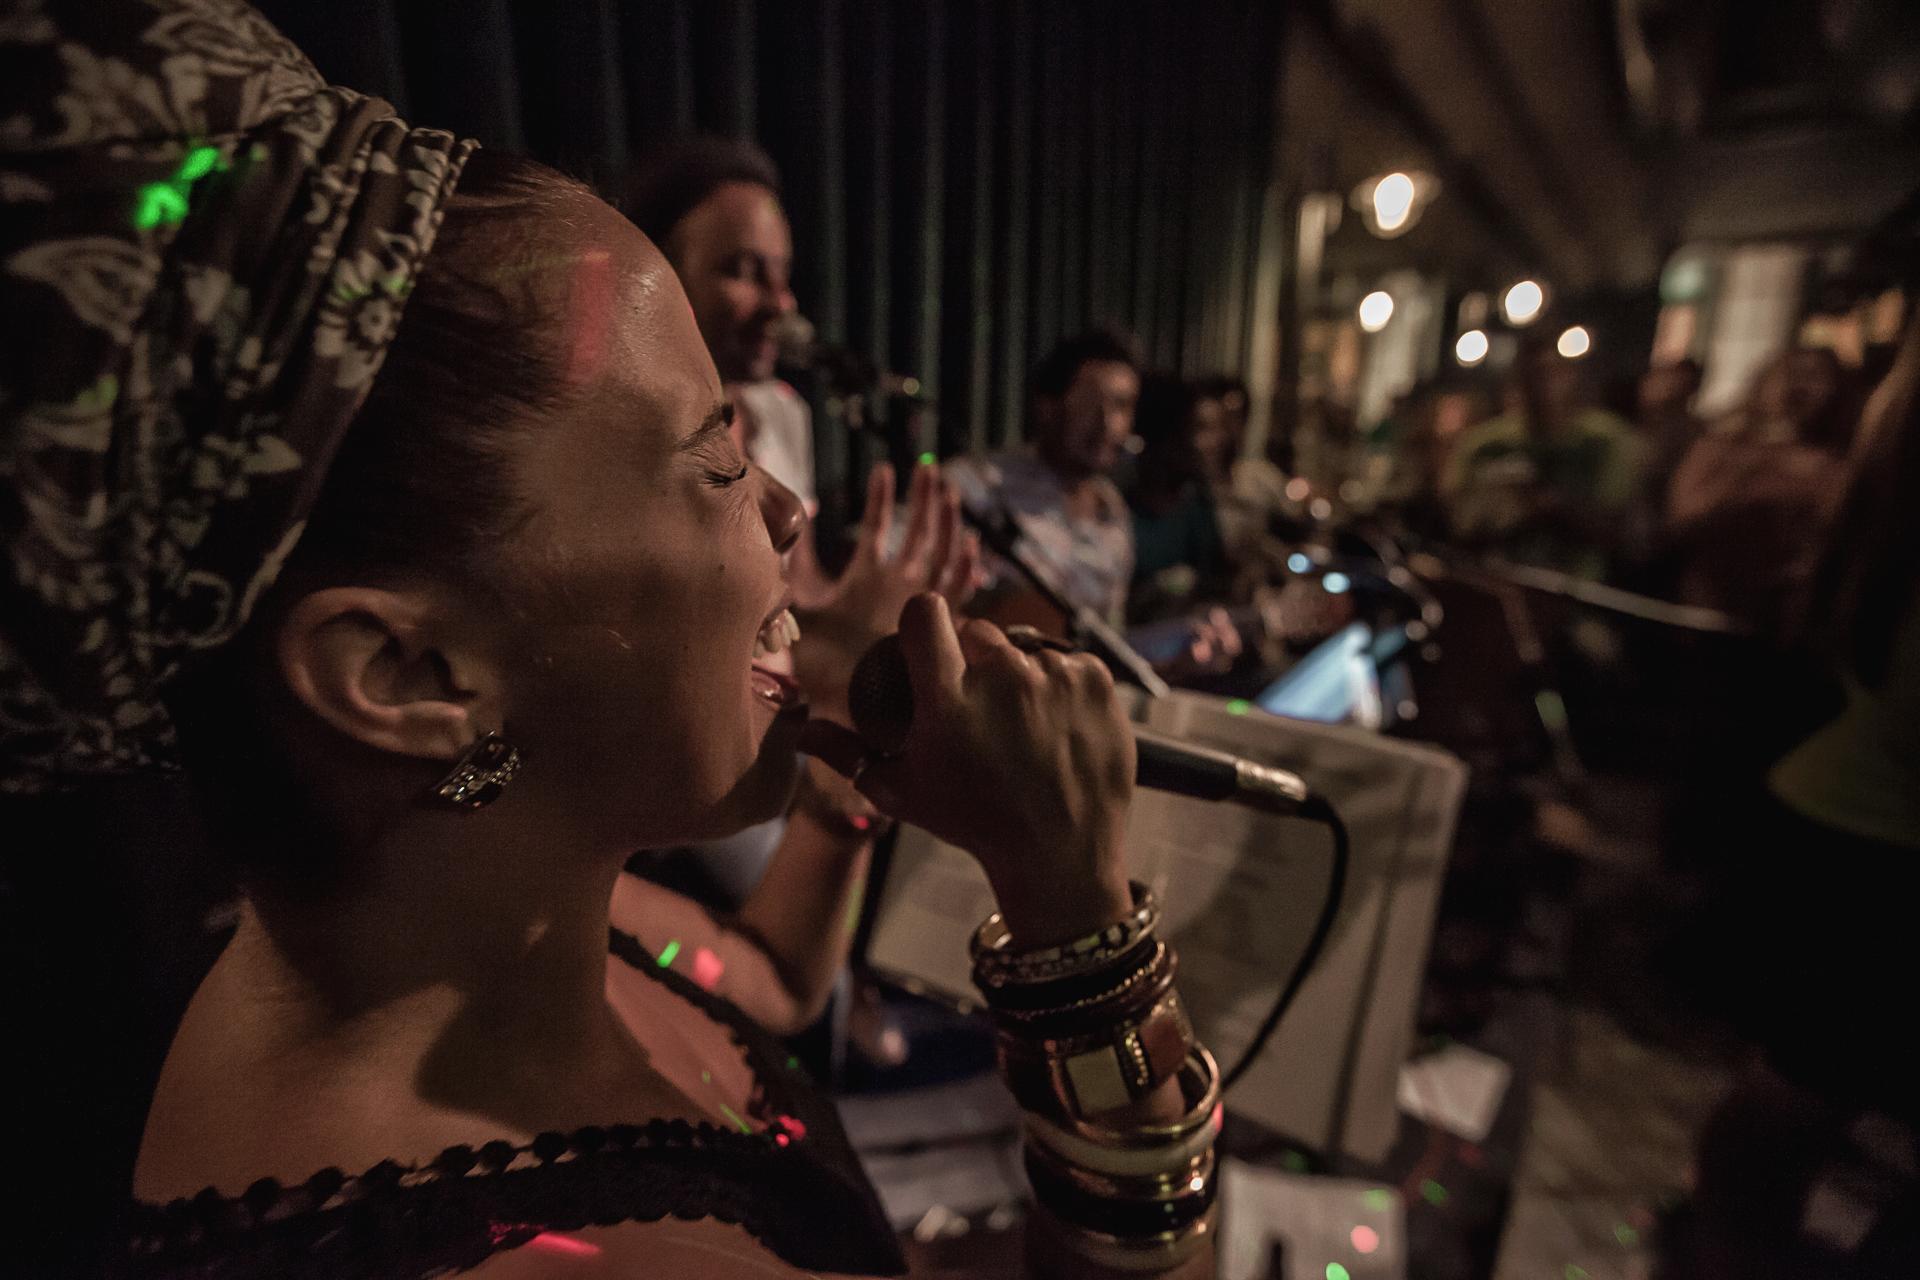 Quintal do Samba Rua Concert On Stage Photography Fotografia bonjourmolotov Andre Gigante 06